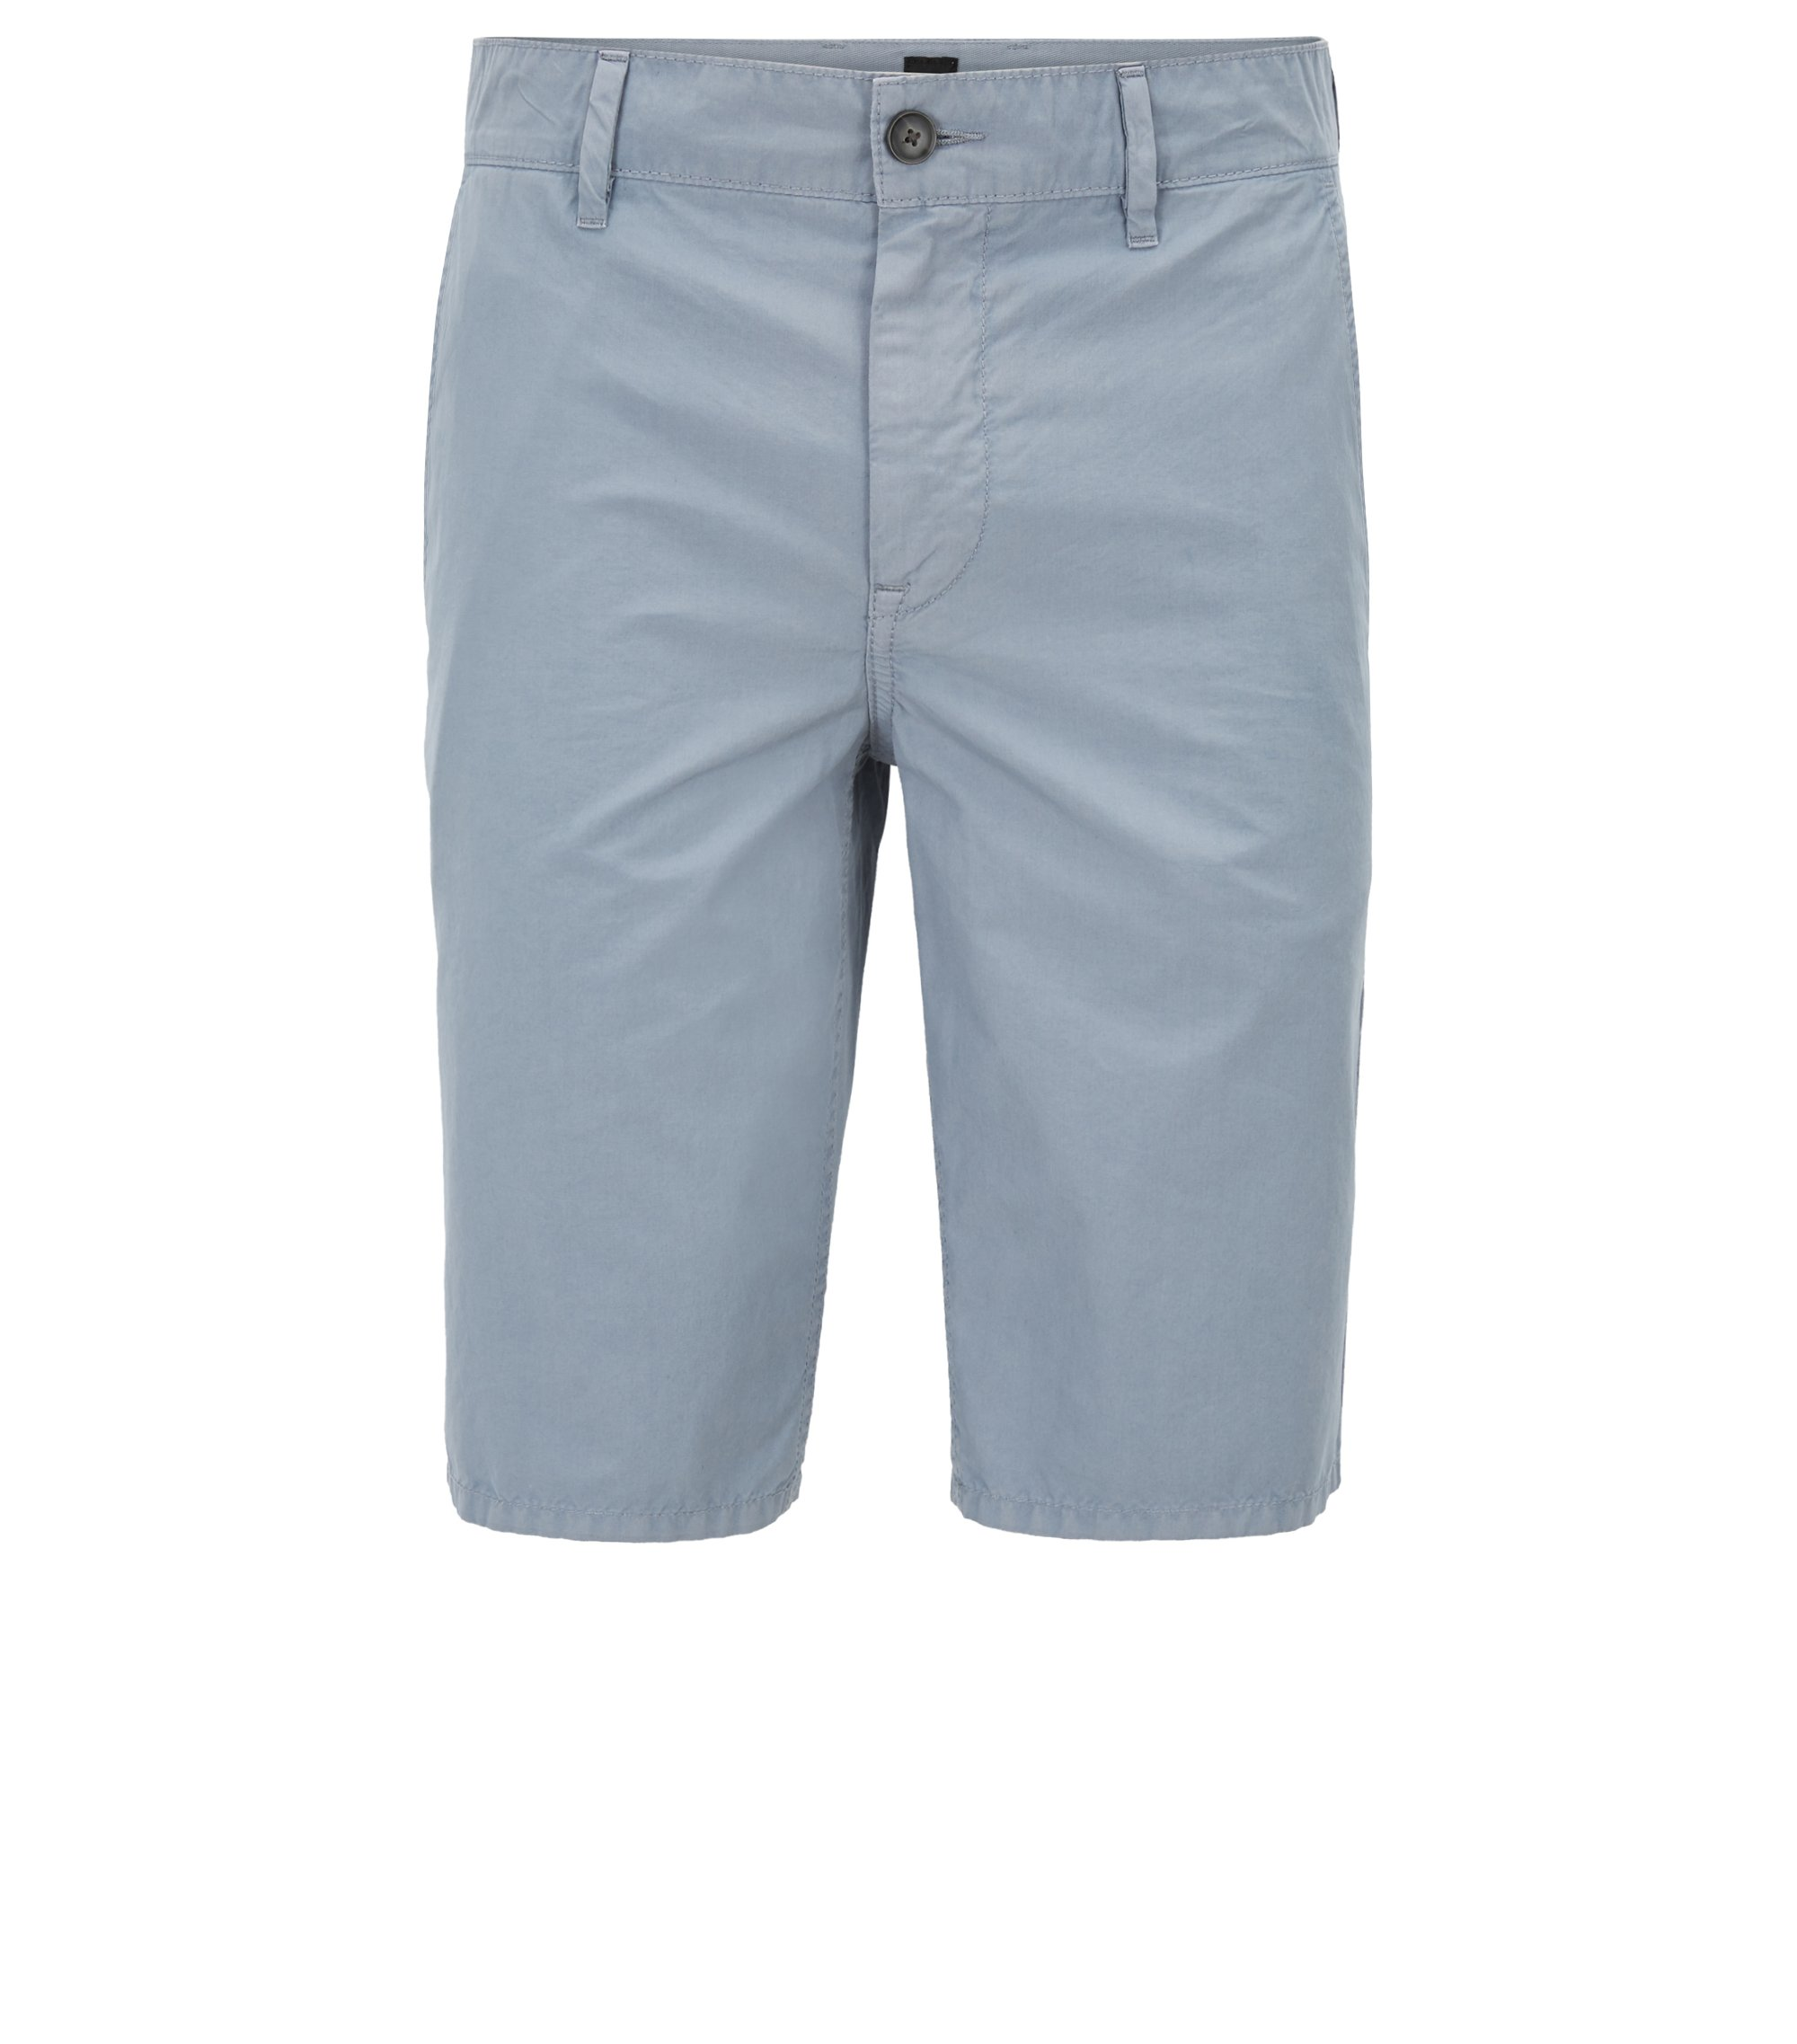 Shorts slim fit en popelín de algodón con teñido especial, Azul